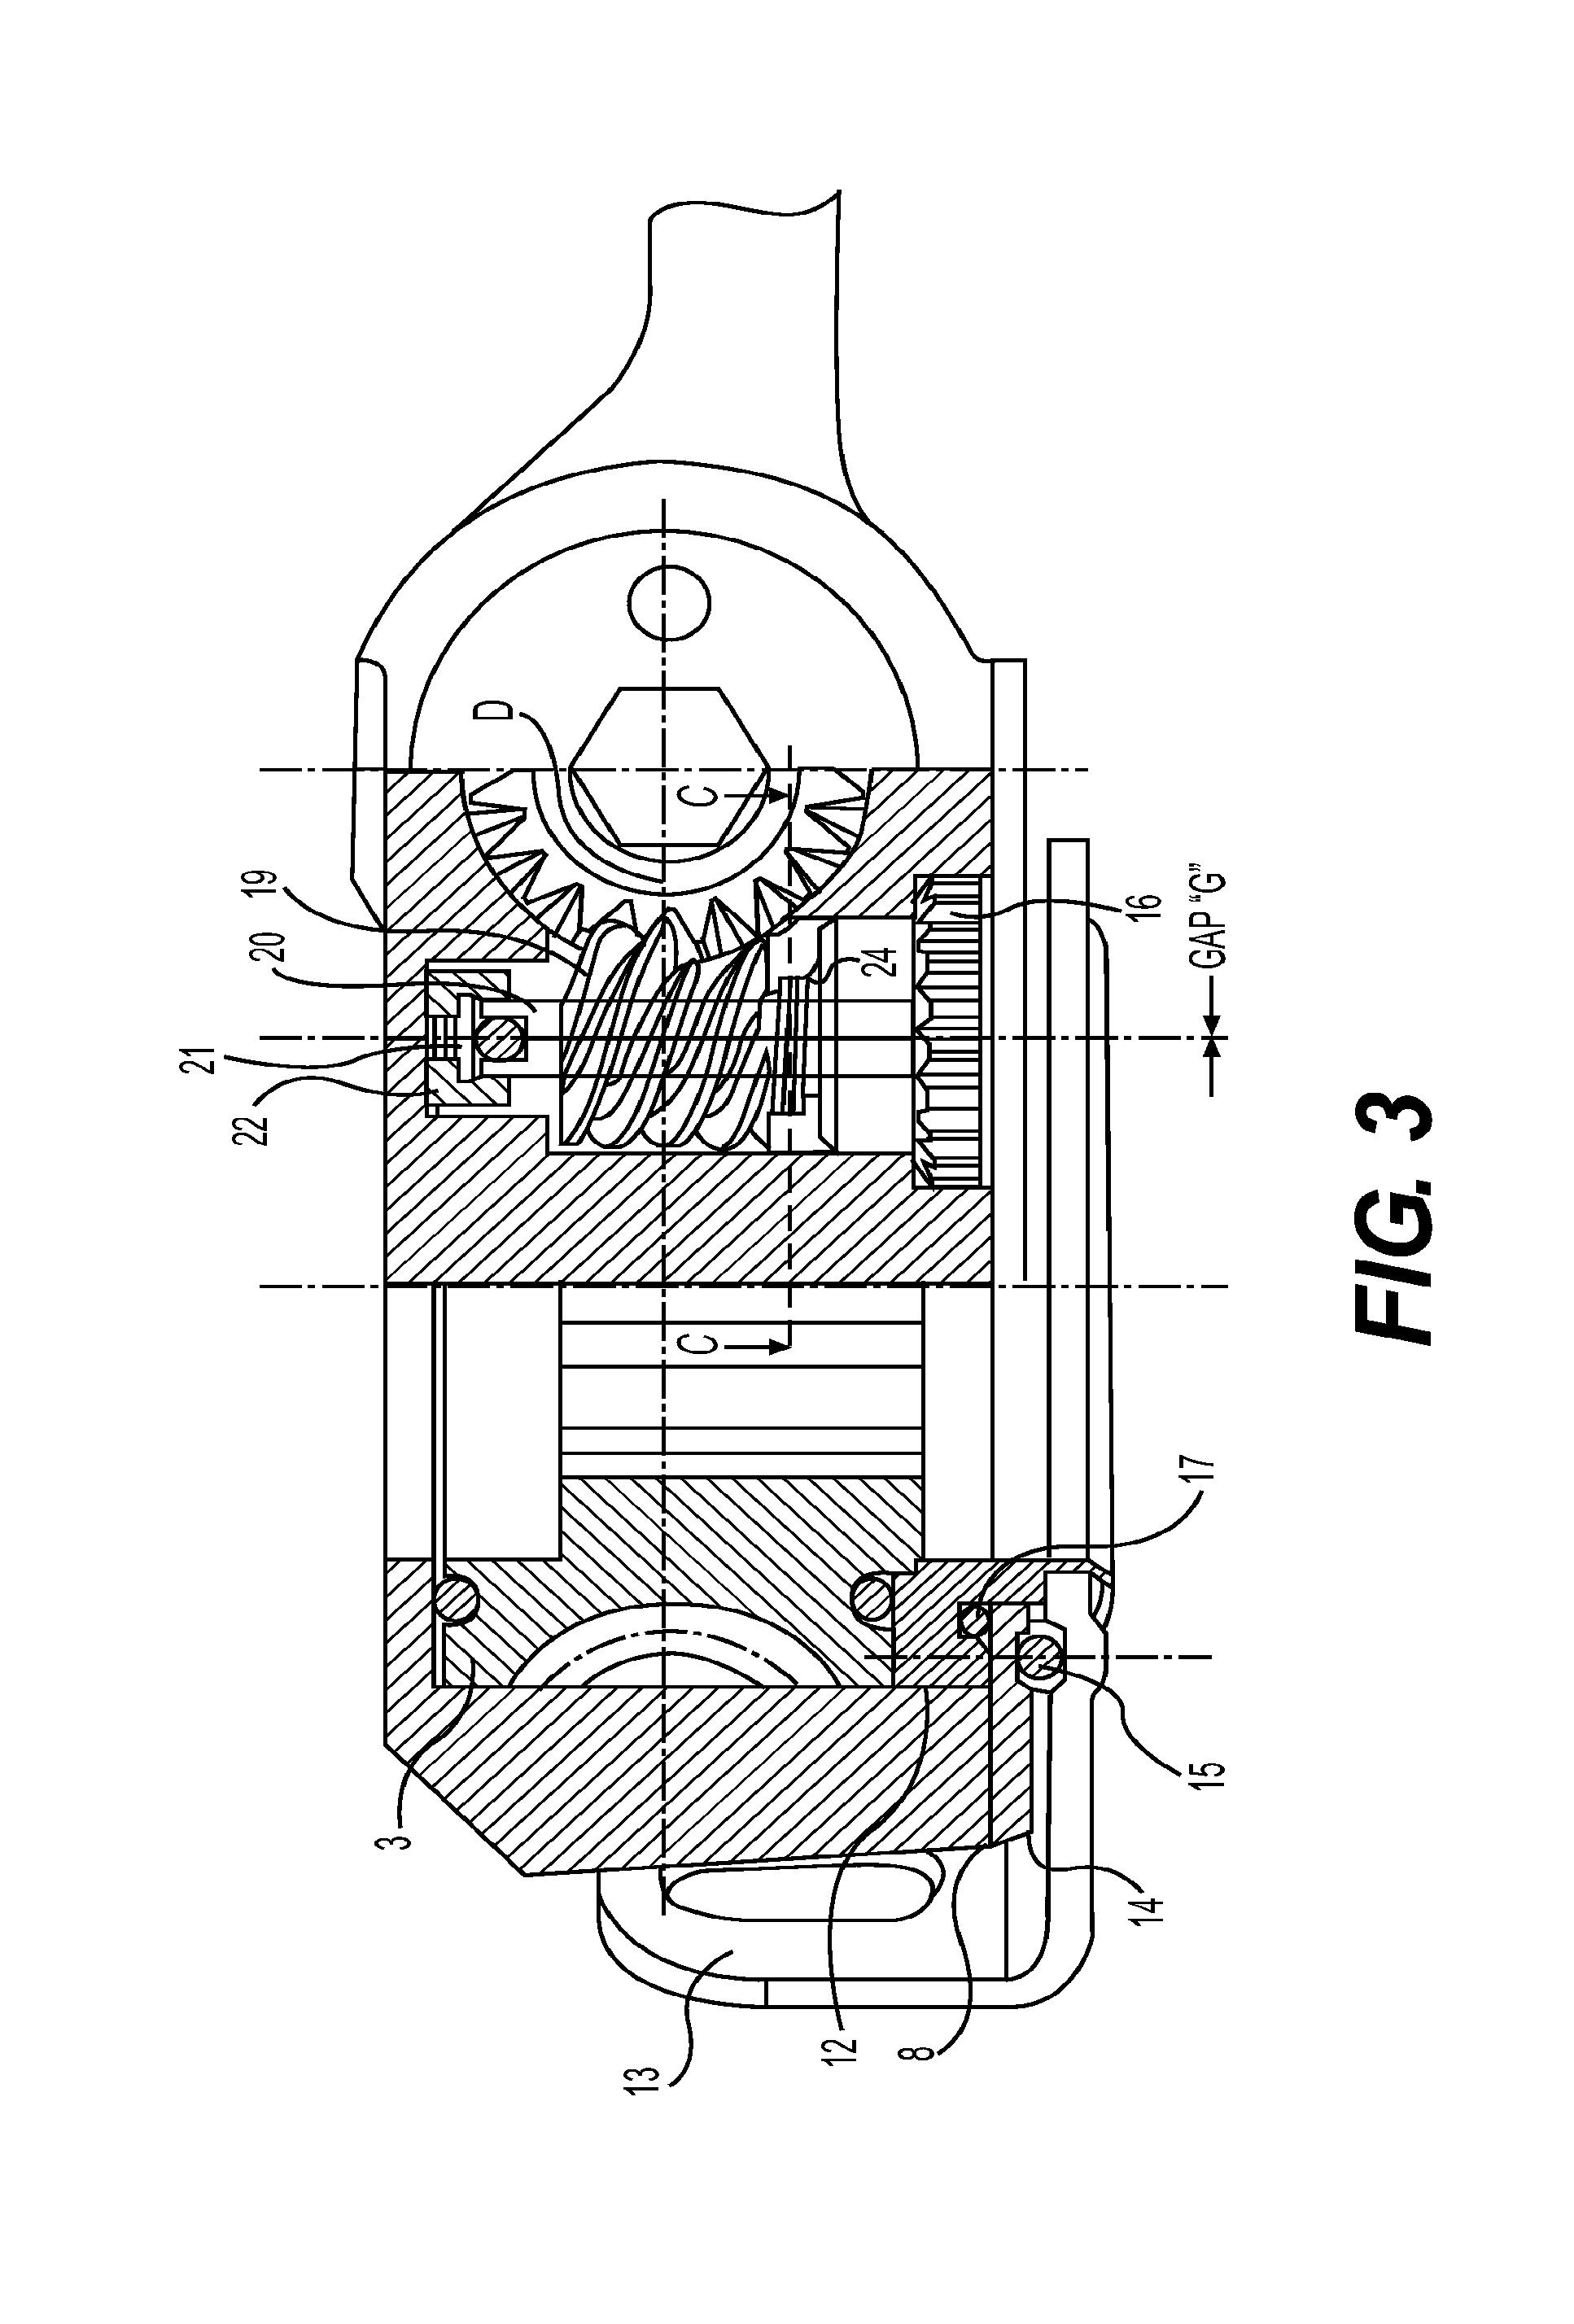 Brake Lining Draw : Patent us automatic brake adjuster for adjusting